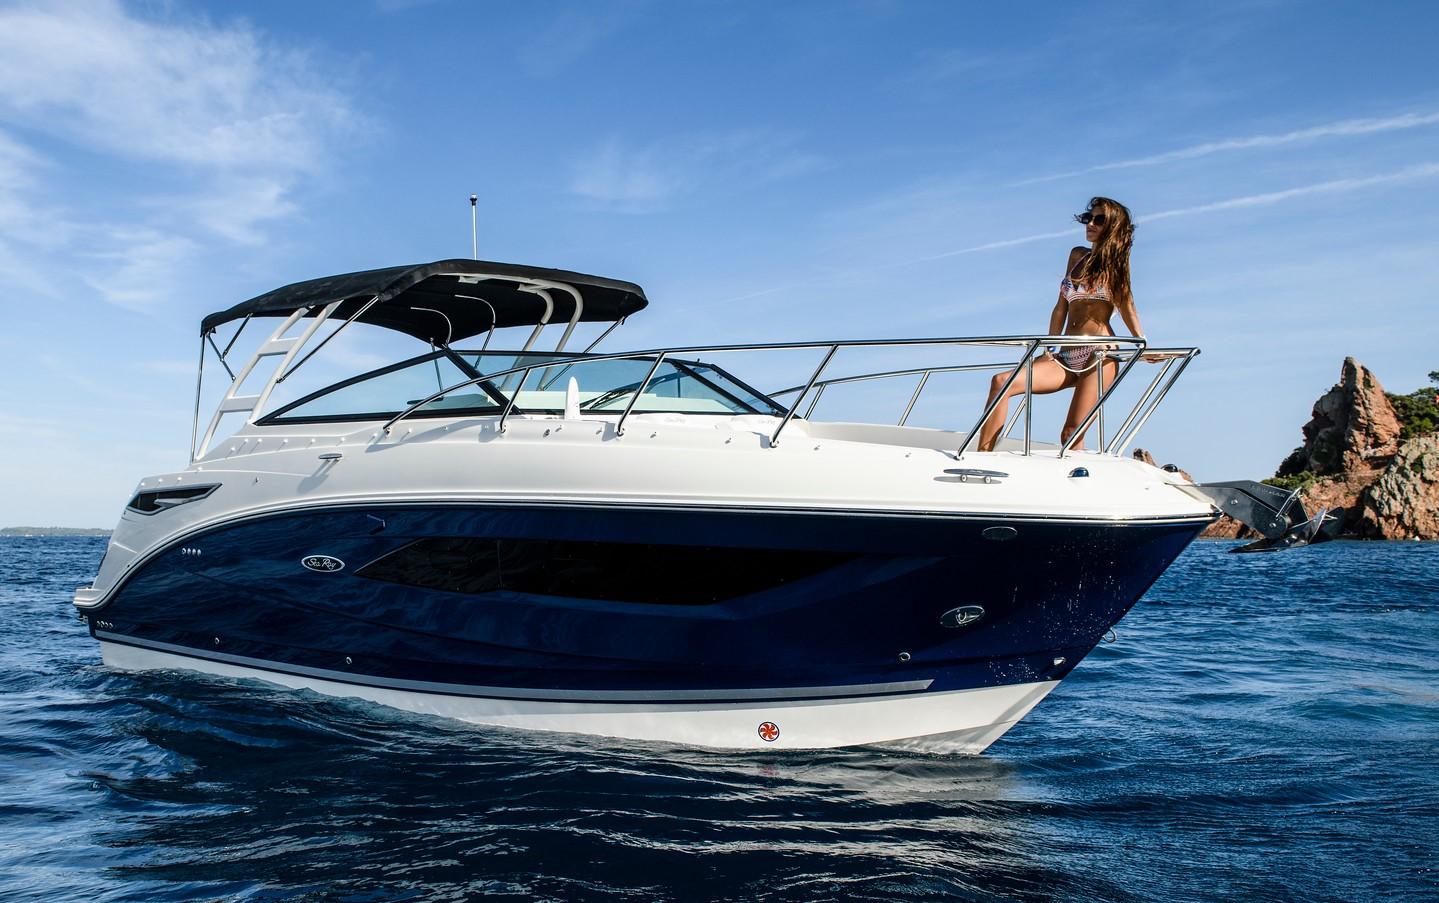 New boats for Sale Mandelieu Cannes Nice (06)